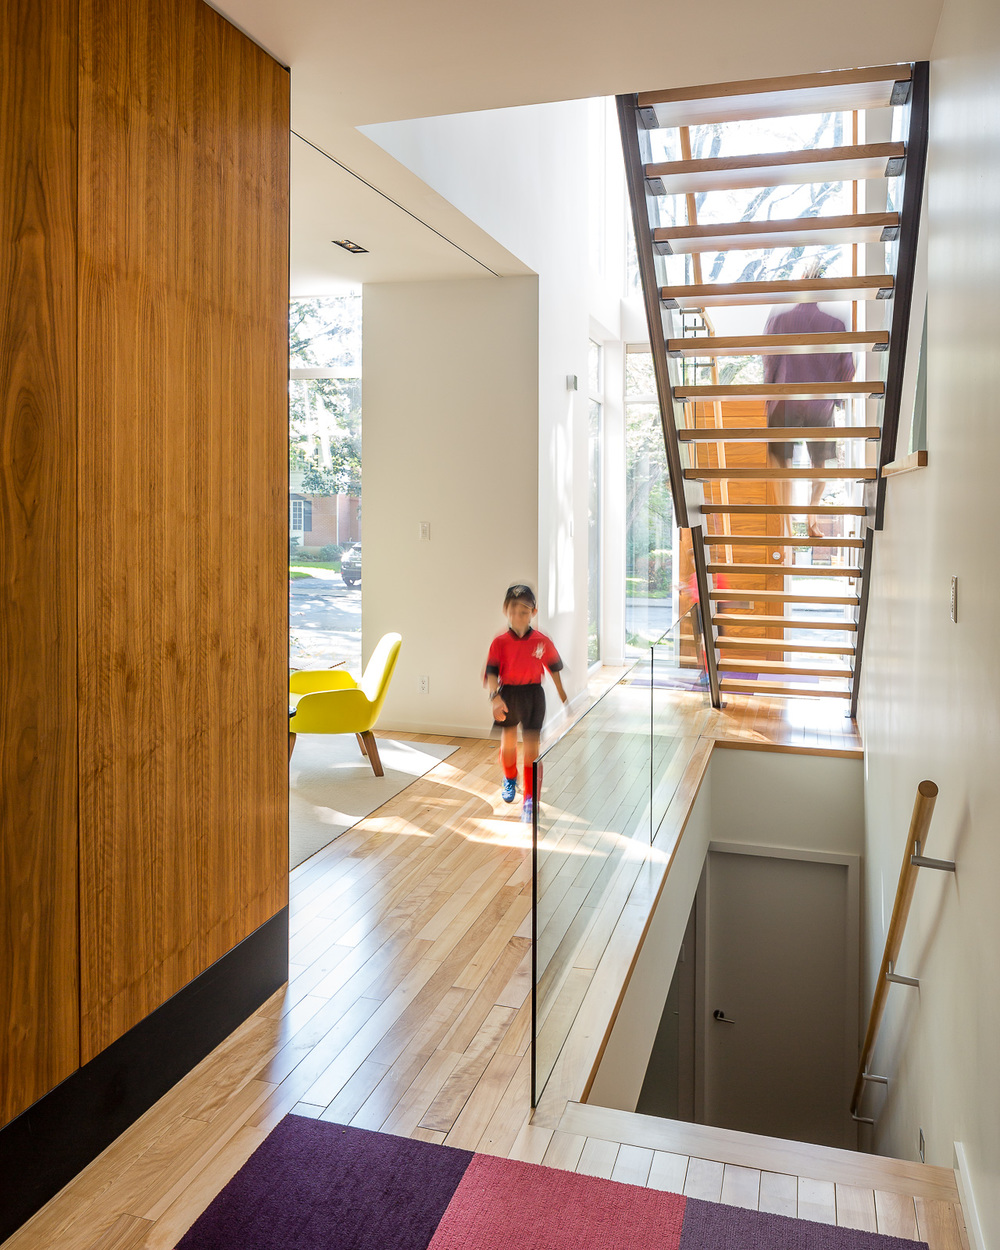 doublespace flynn avenue residence-0070-Edit.jpg